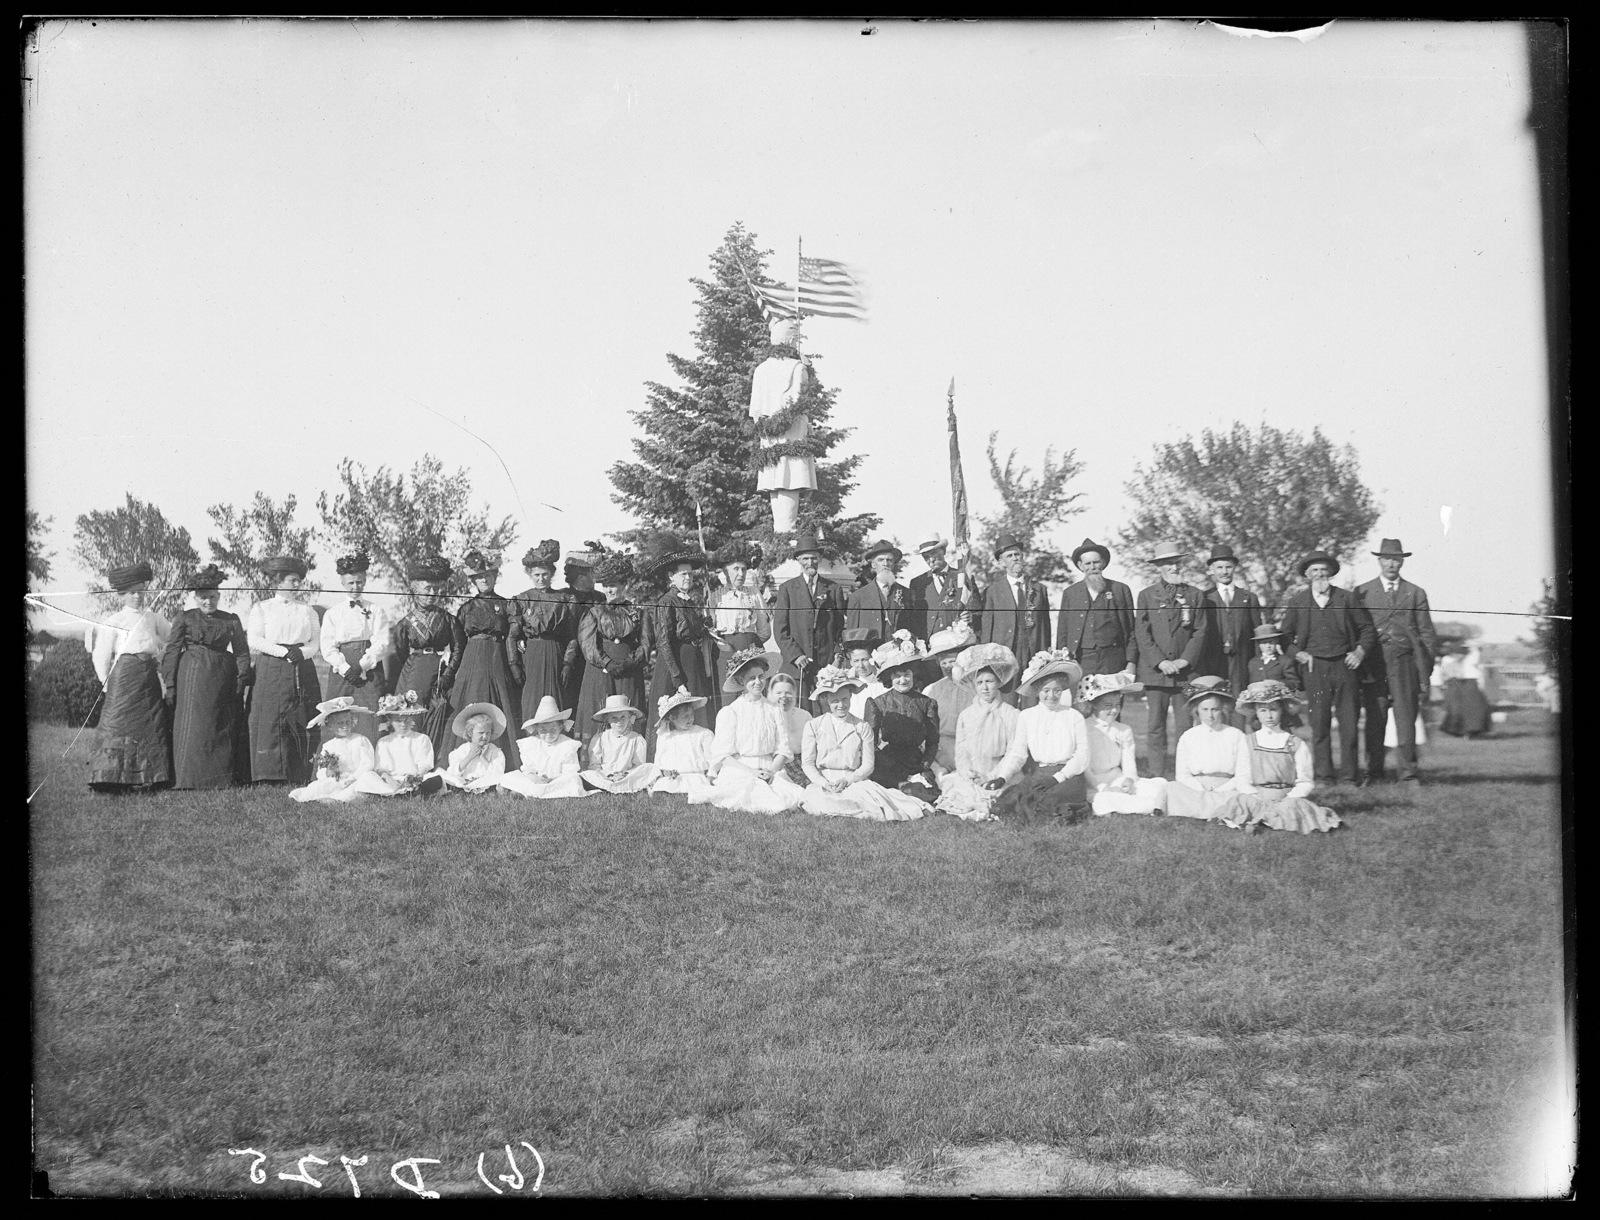 Memorial Day services, Bayard, Morrill County, Nebraska